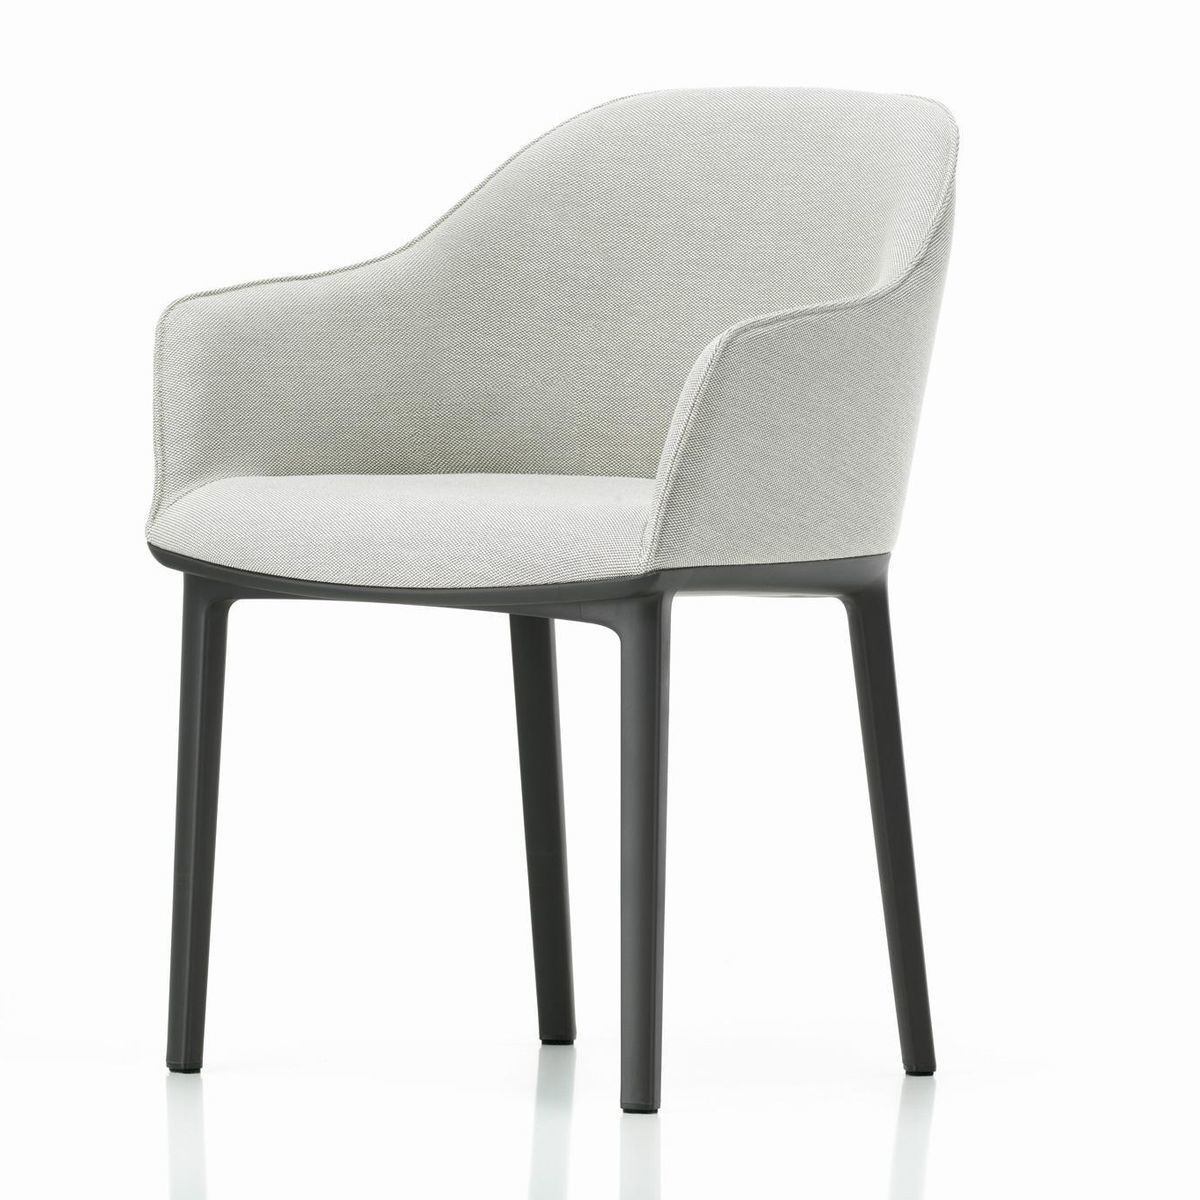 softshell chair stuhl vitra. Black Bedroom Furniture Sets. Home Design Ideas